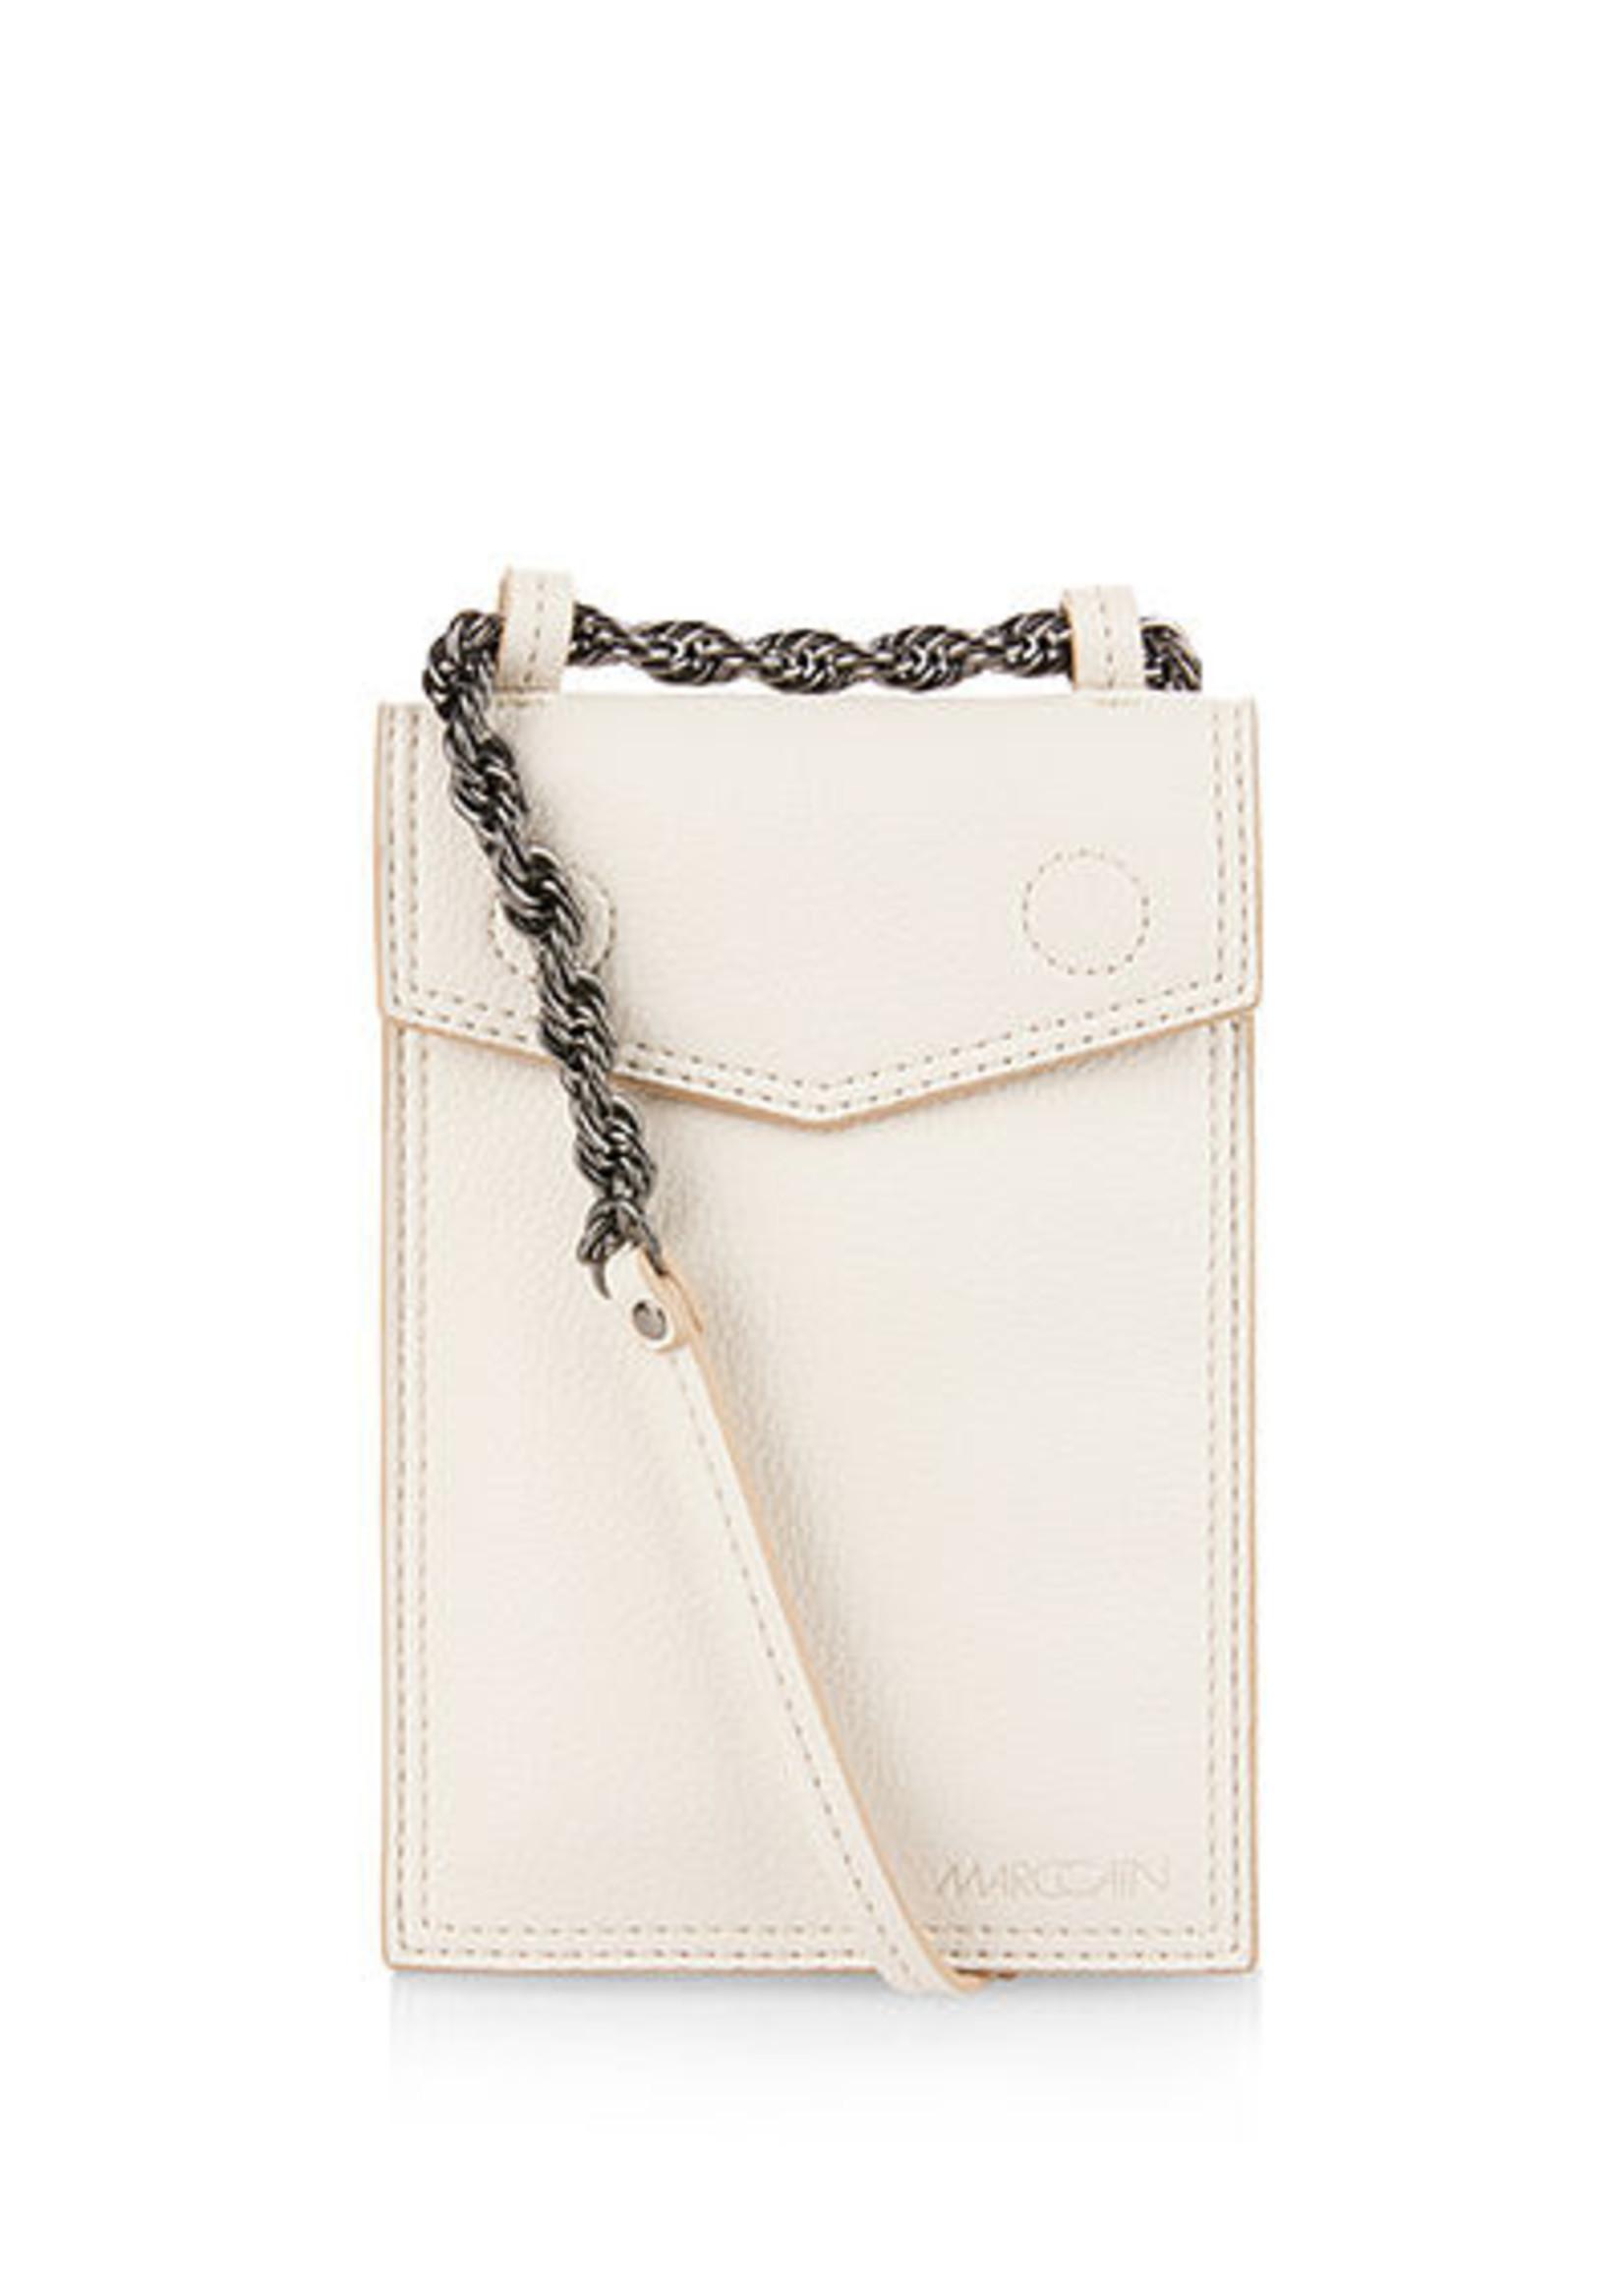 Marccain Bags & Shoes Mini bag RB TM.01 Z03 panna cotta